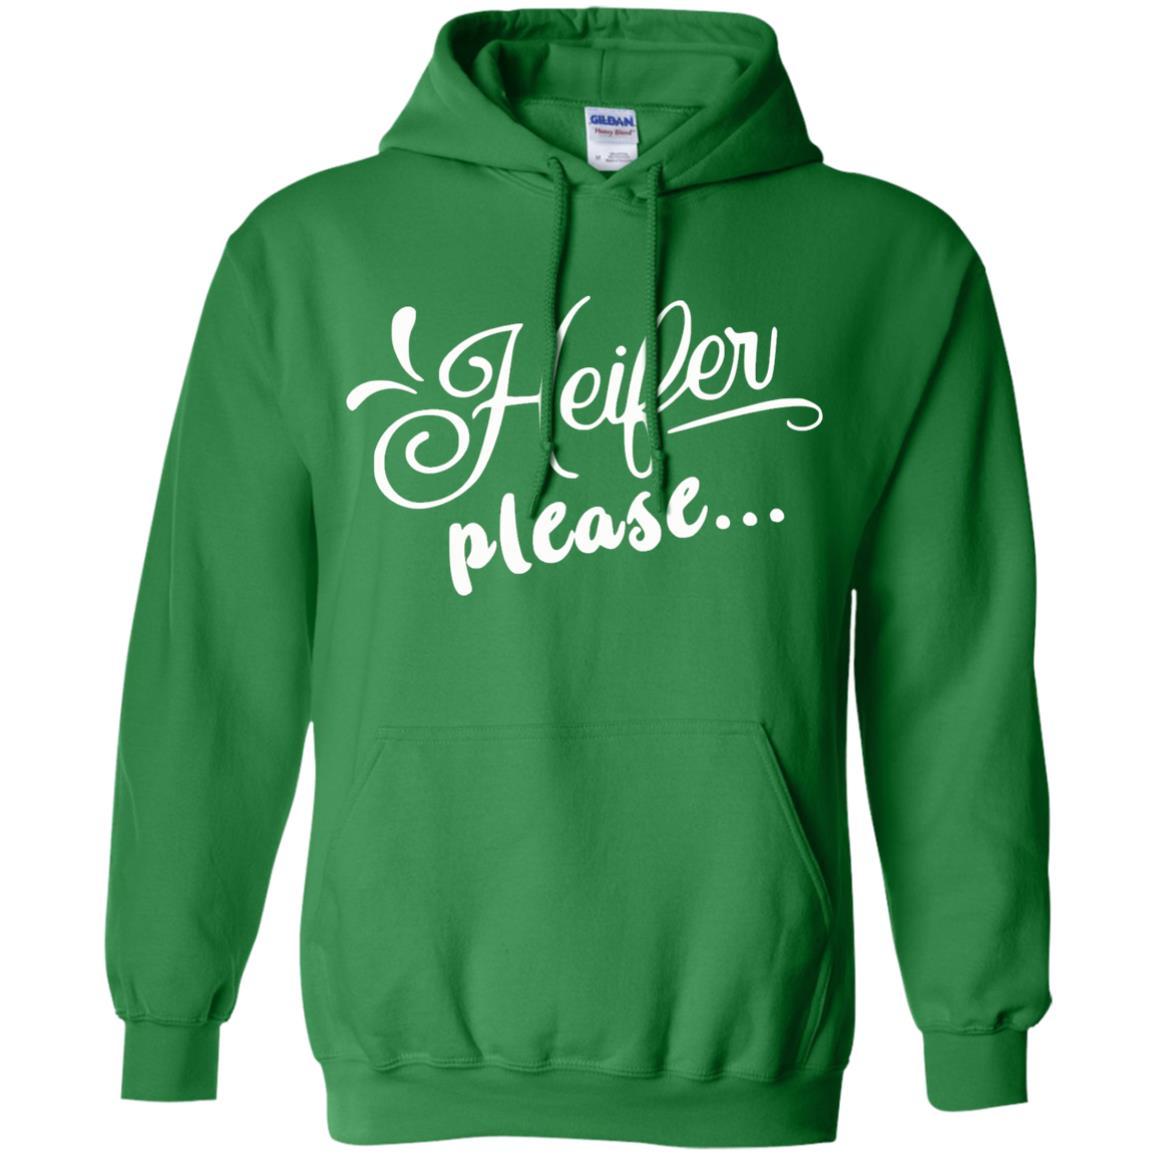 image 2150 - Heifer Please shirt, sweater: funny farmer apparel